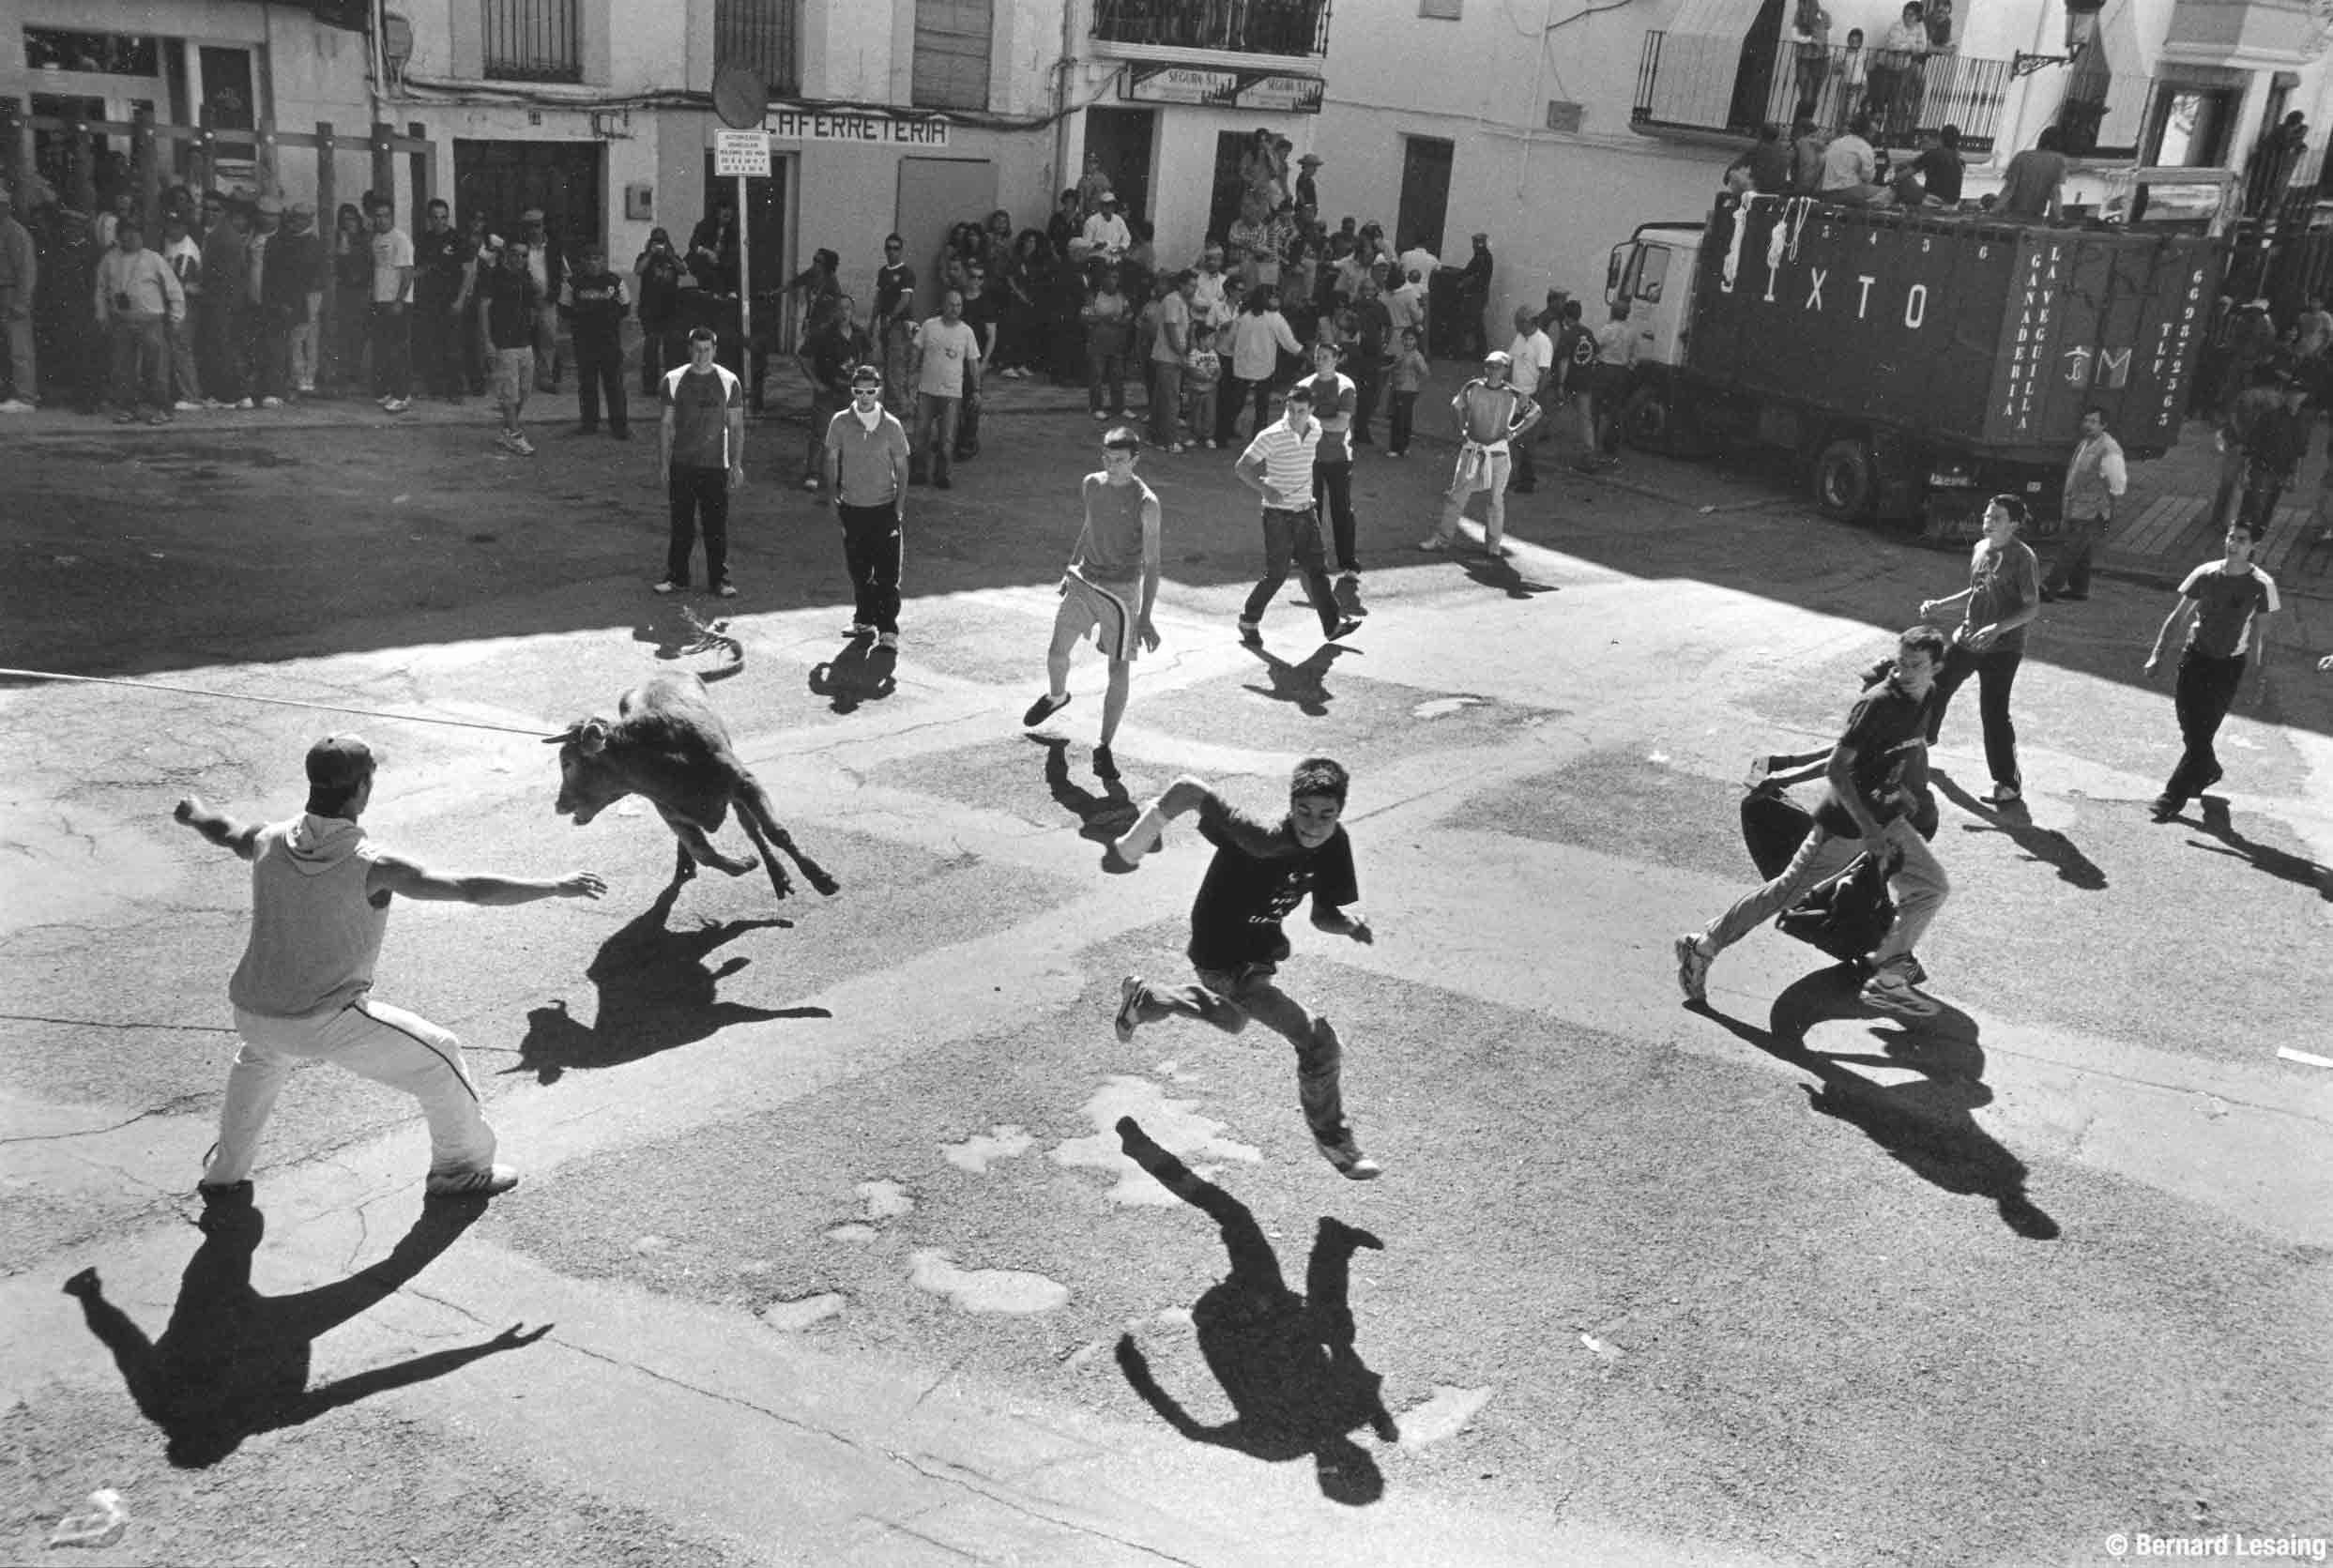 Beas de Segura, Andalousie, 2008 © Bernard Lesaing